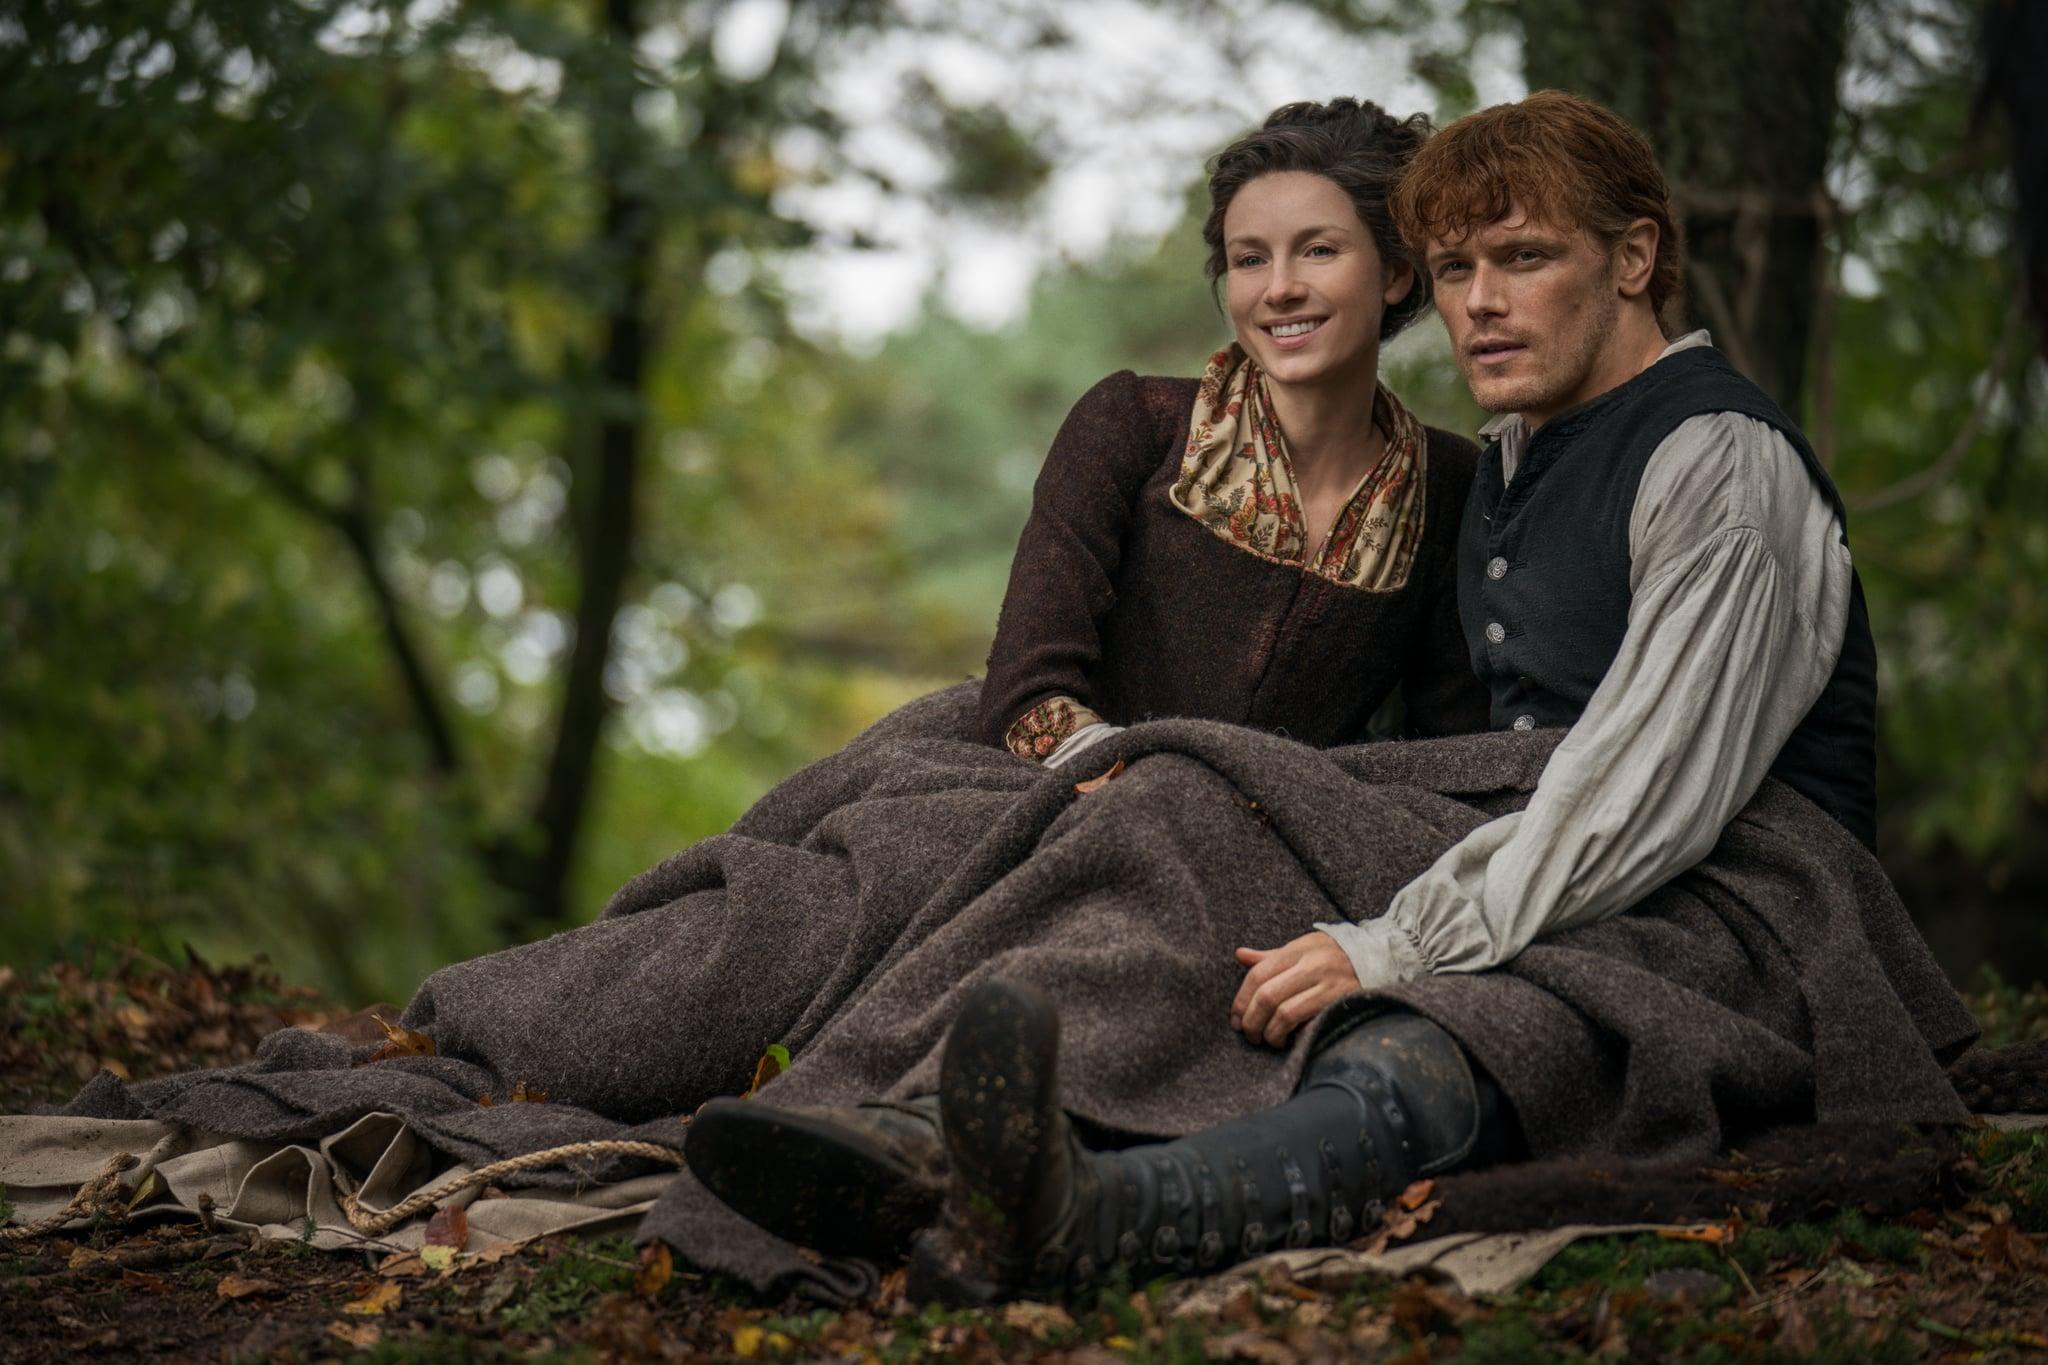 Outlander Season 4 stars Caitriona Balfe and Sam Heughan.